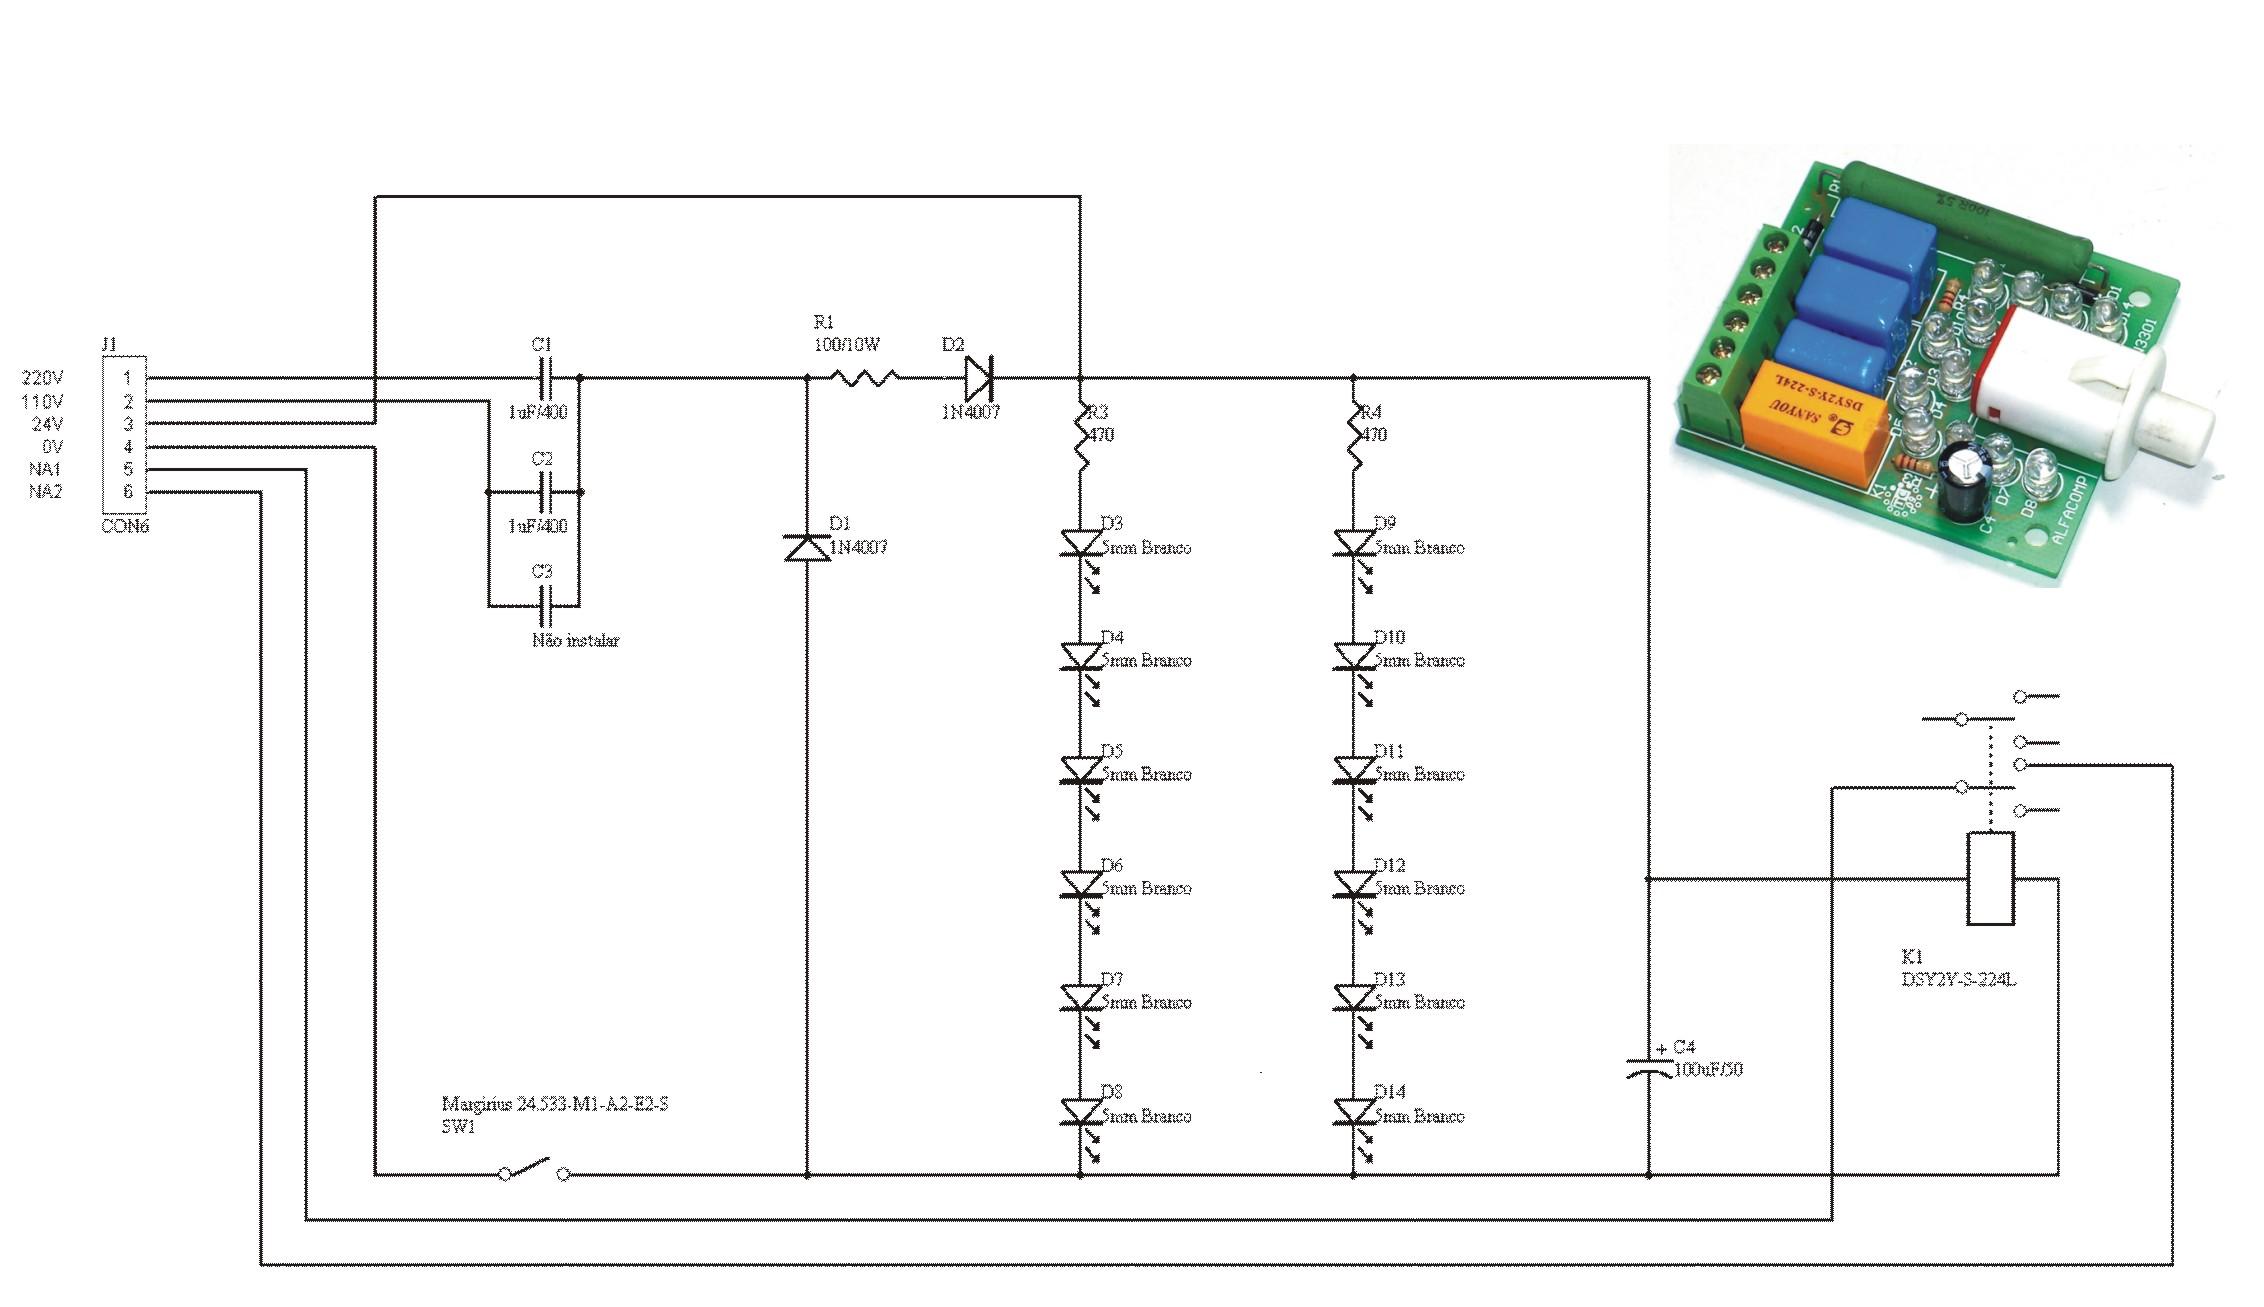 Circuito de iluminador a LED para painel de comando